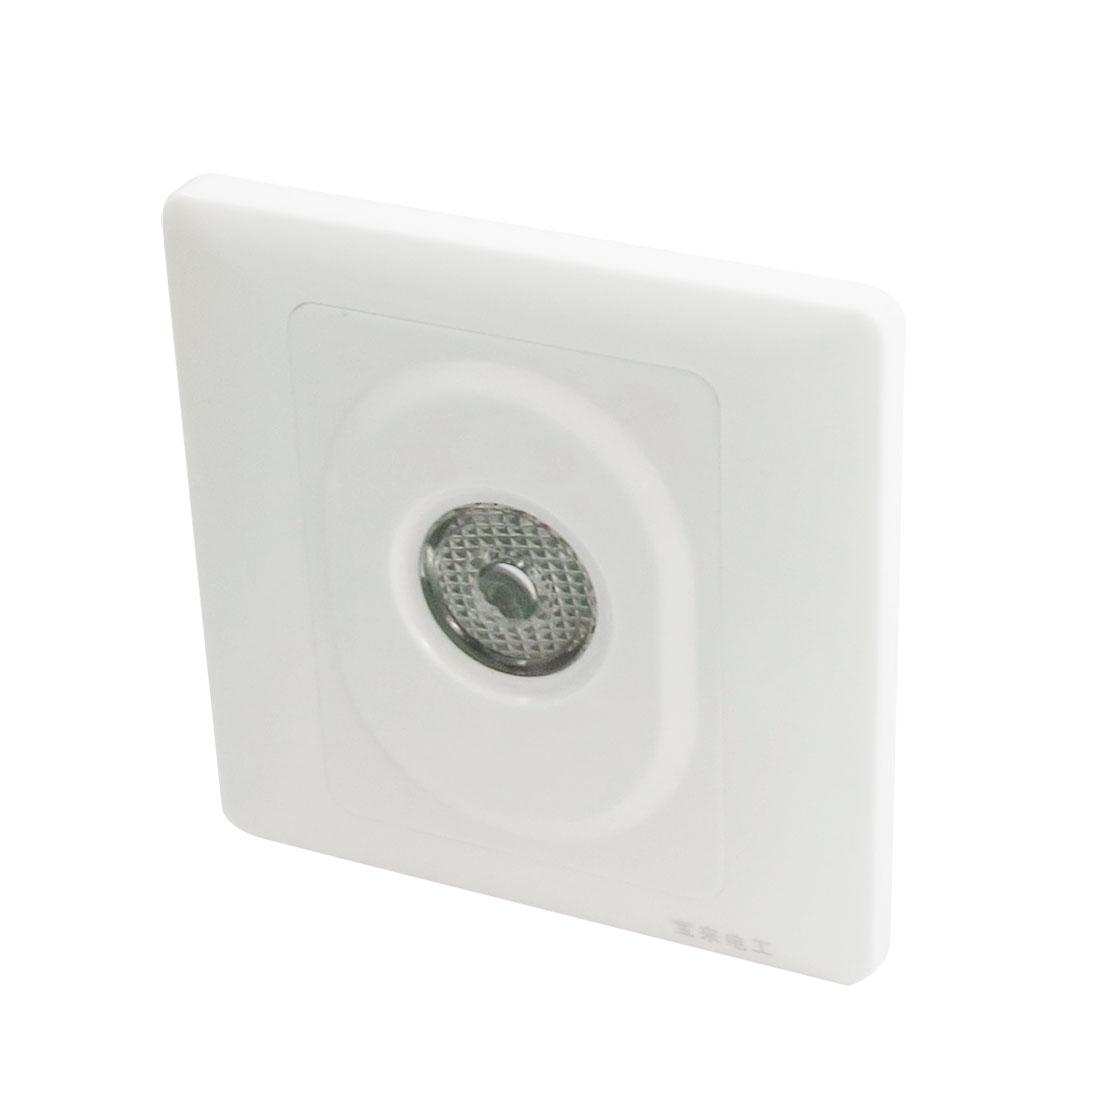 220VAC 5M Sensor Wall Mount Panel Saving Energy Light Switch